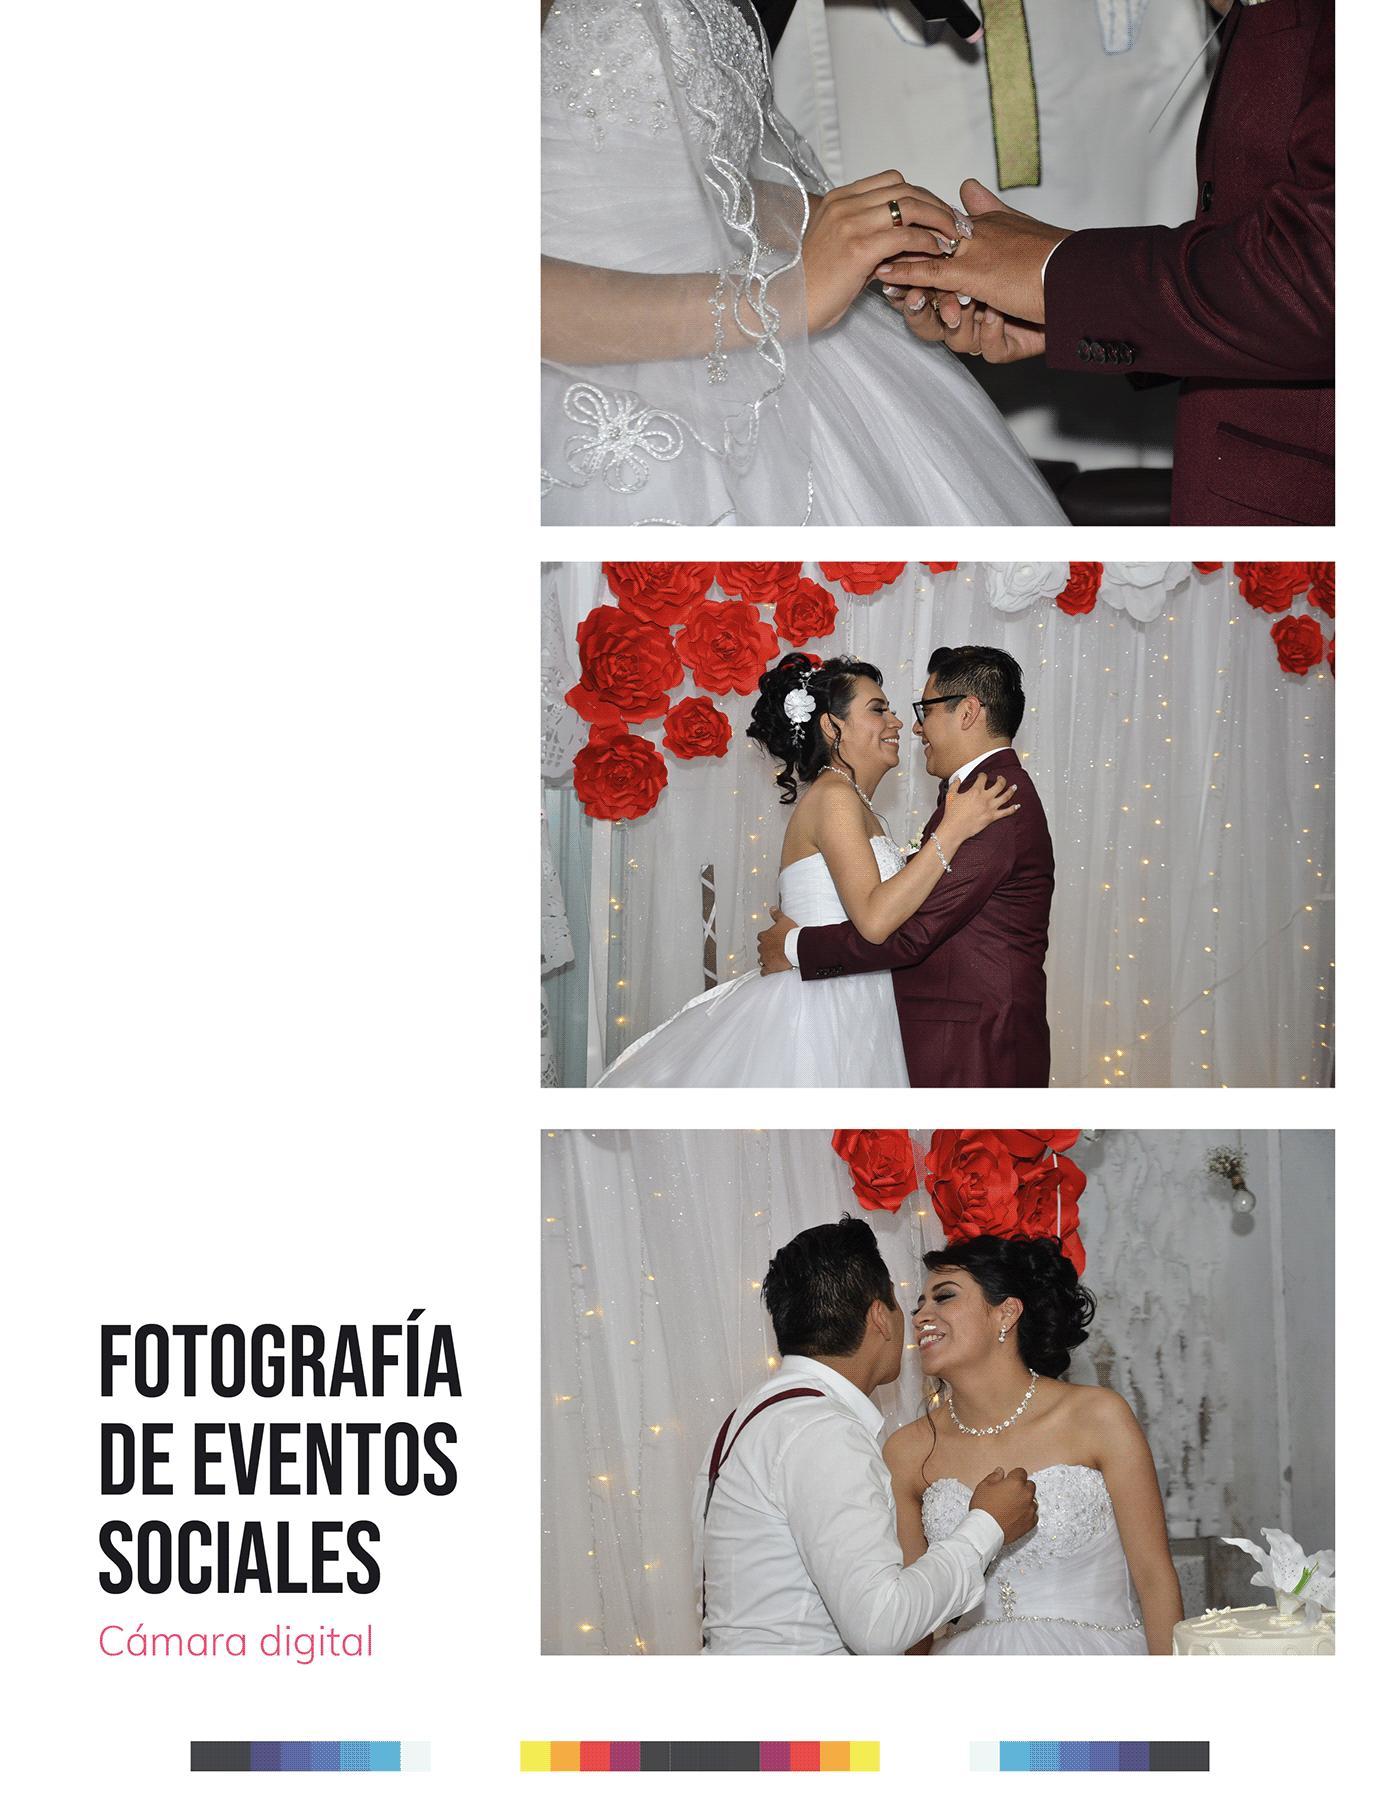 desing editorial illustrations Photography  Socialmedia